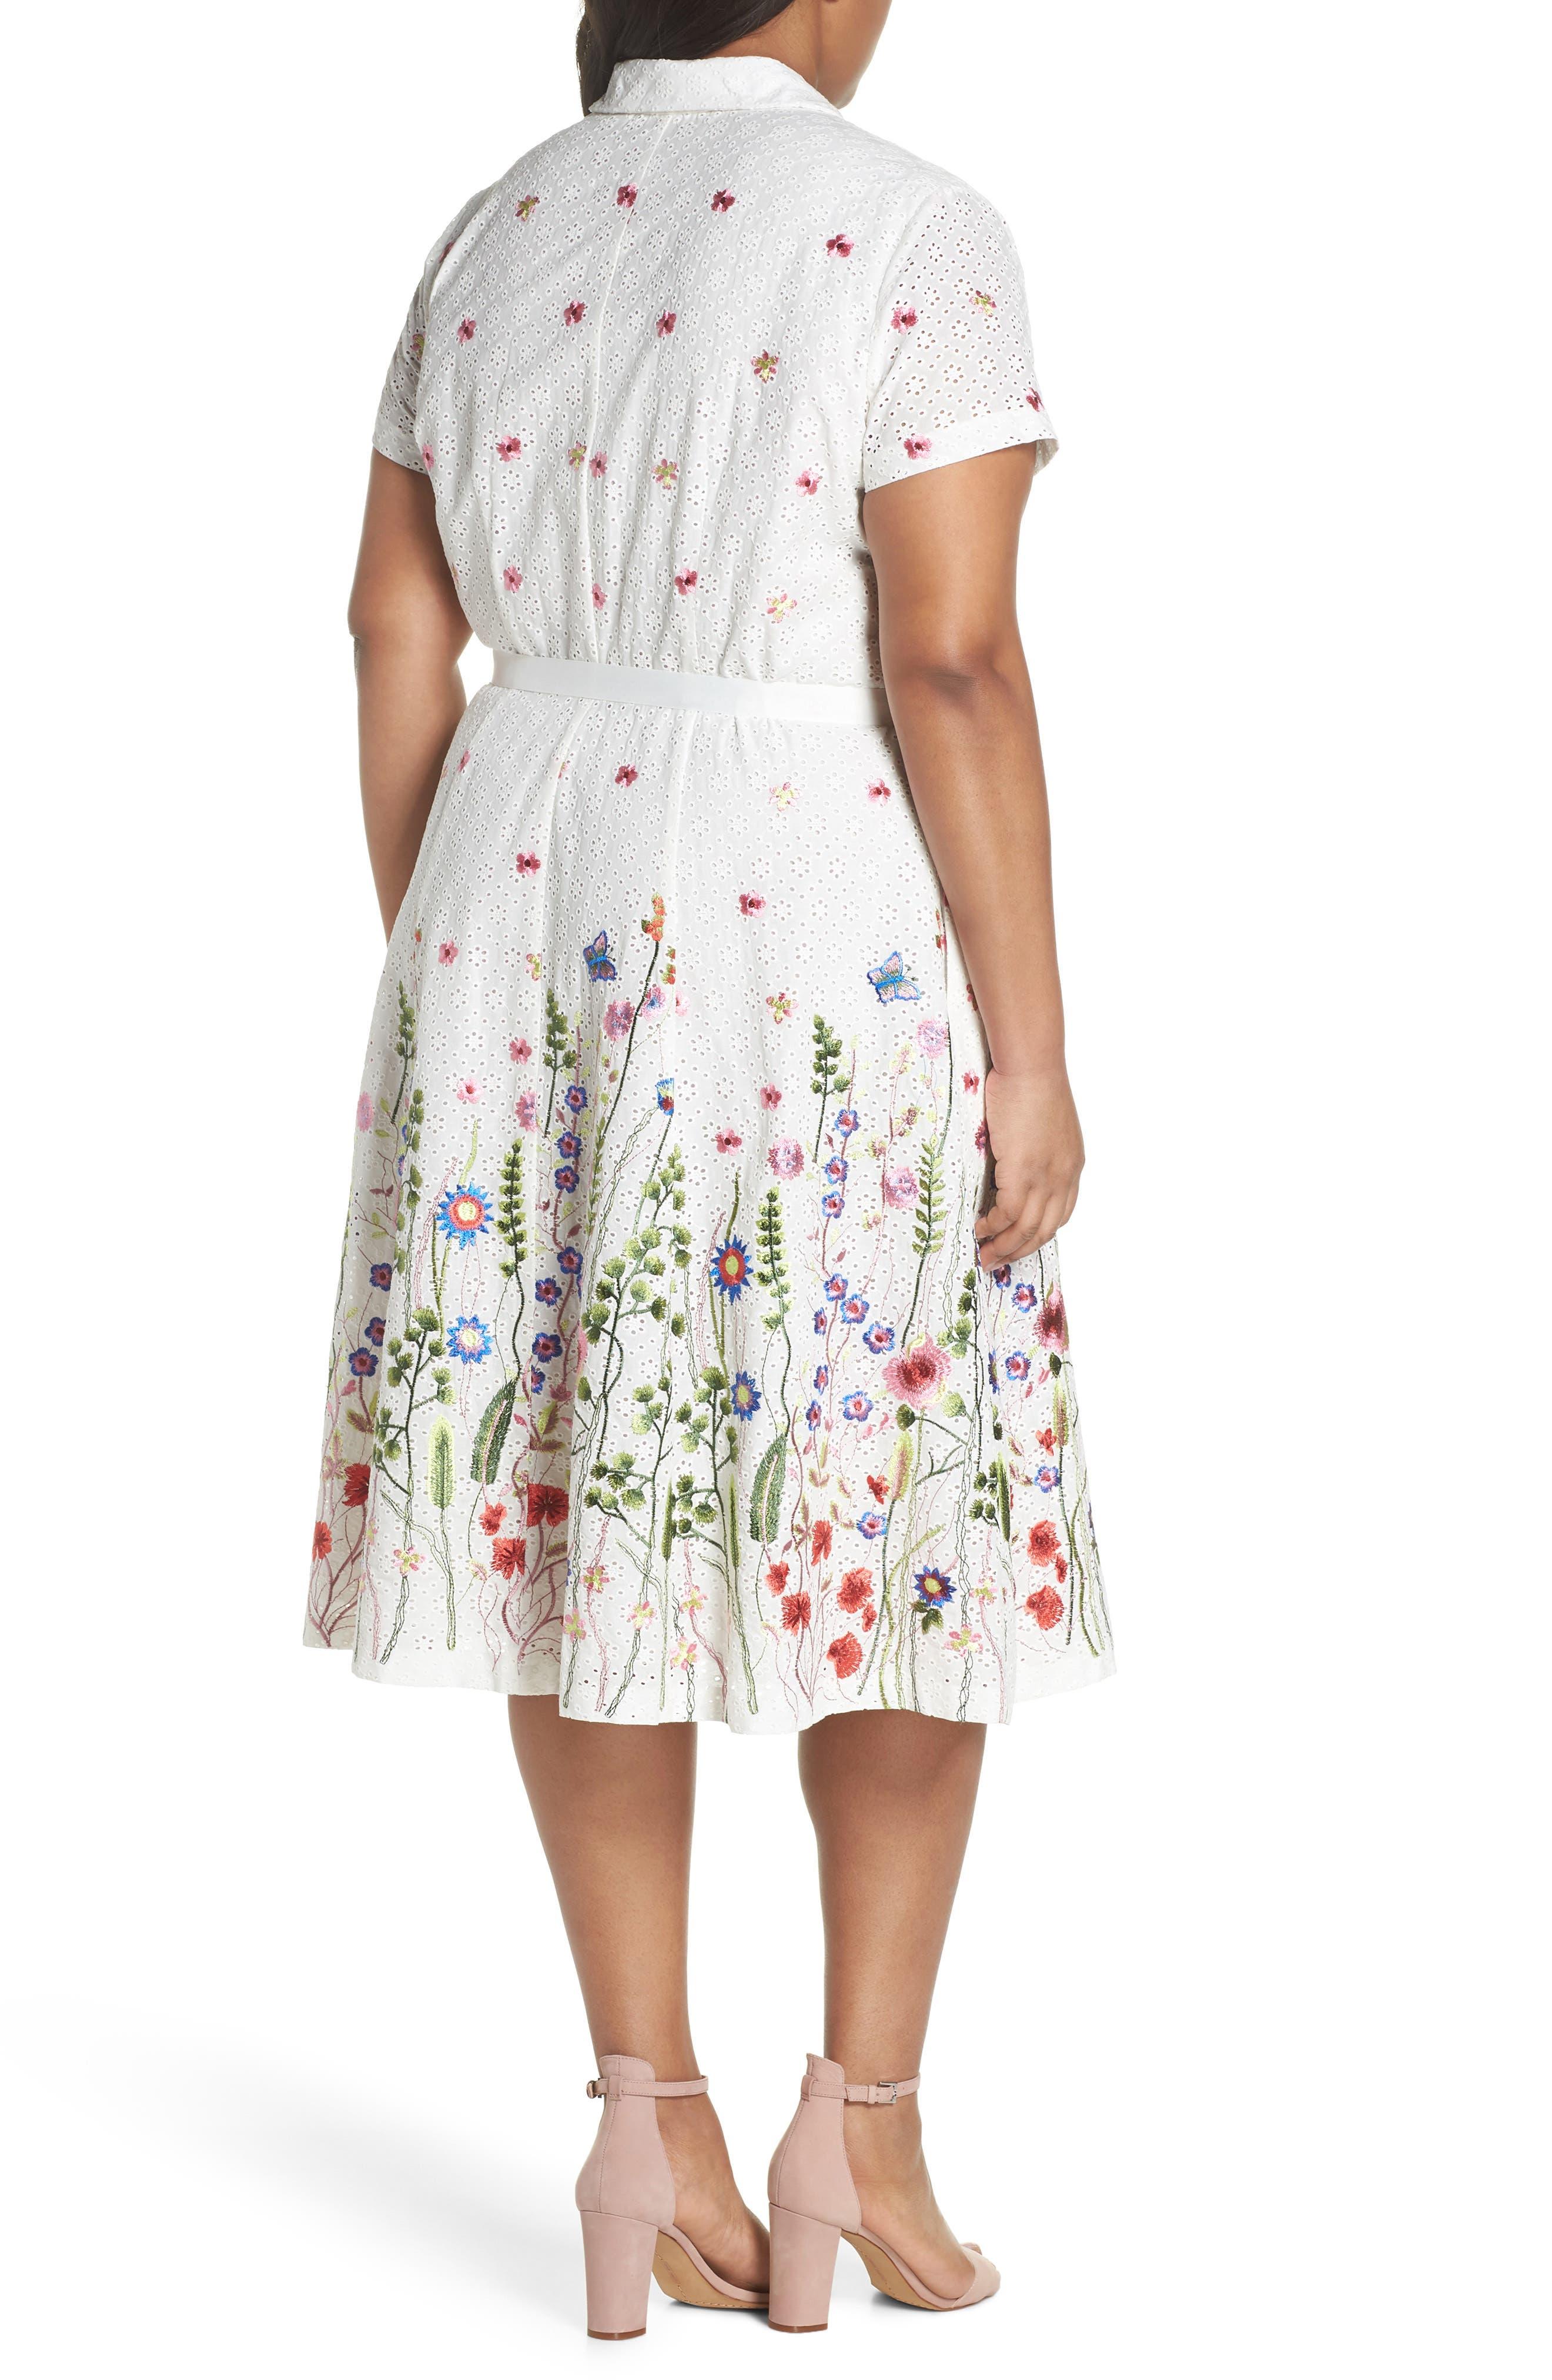 Floral Embroidered Eyelet Shirtdress,                             Alternate thumbnail 2, color,                             White/ Royal/ Green